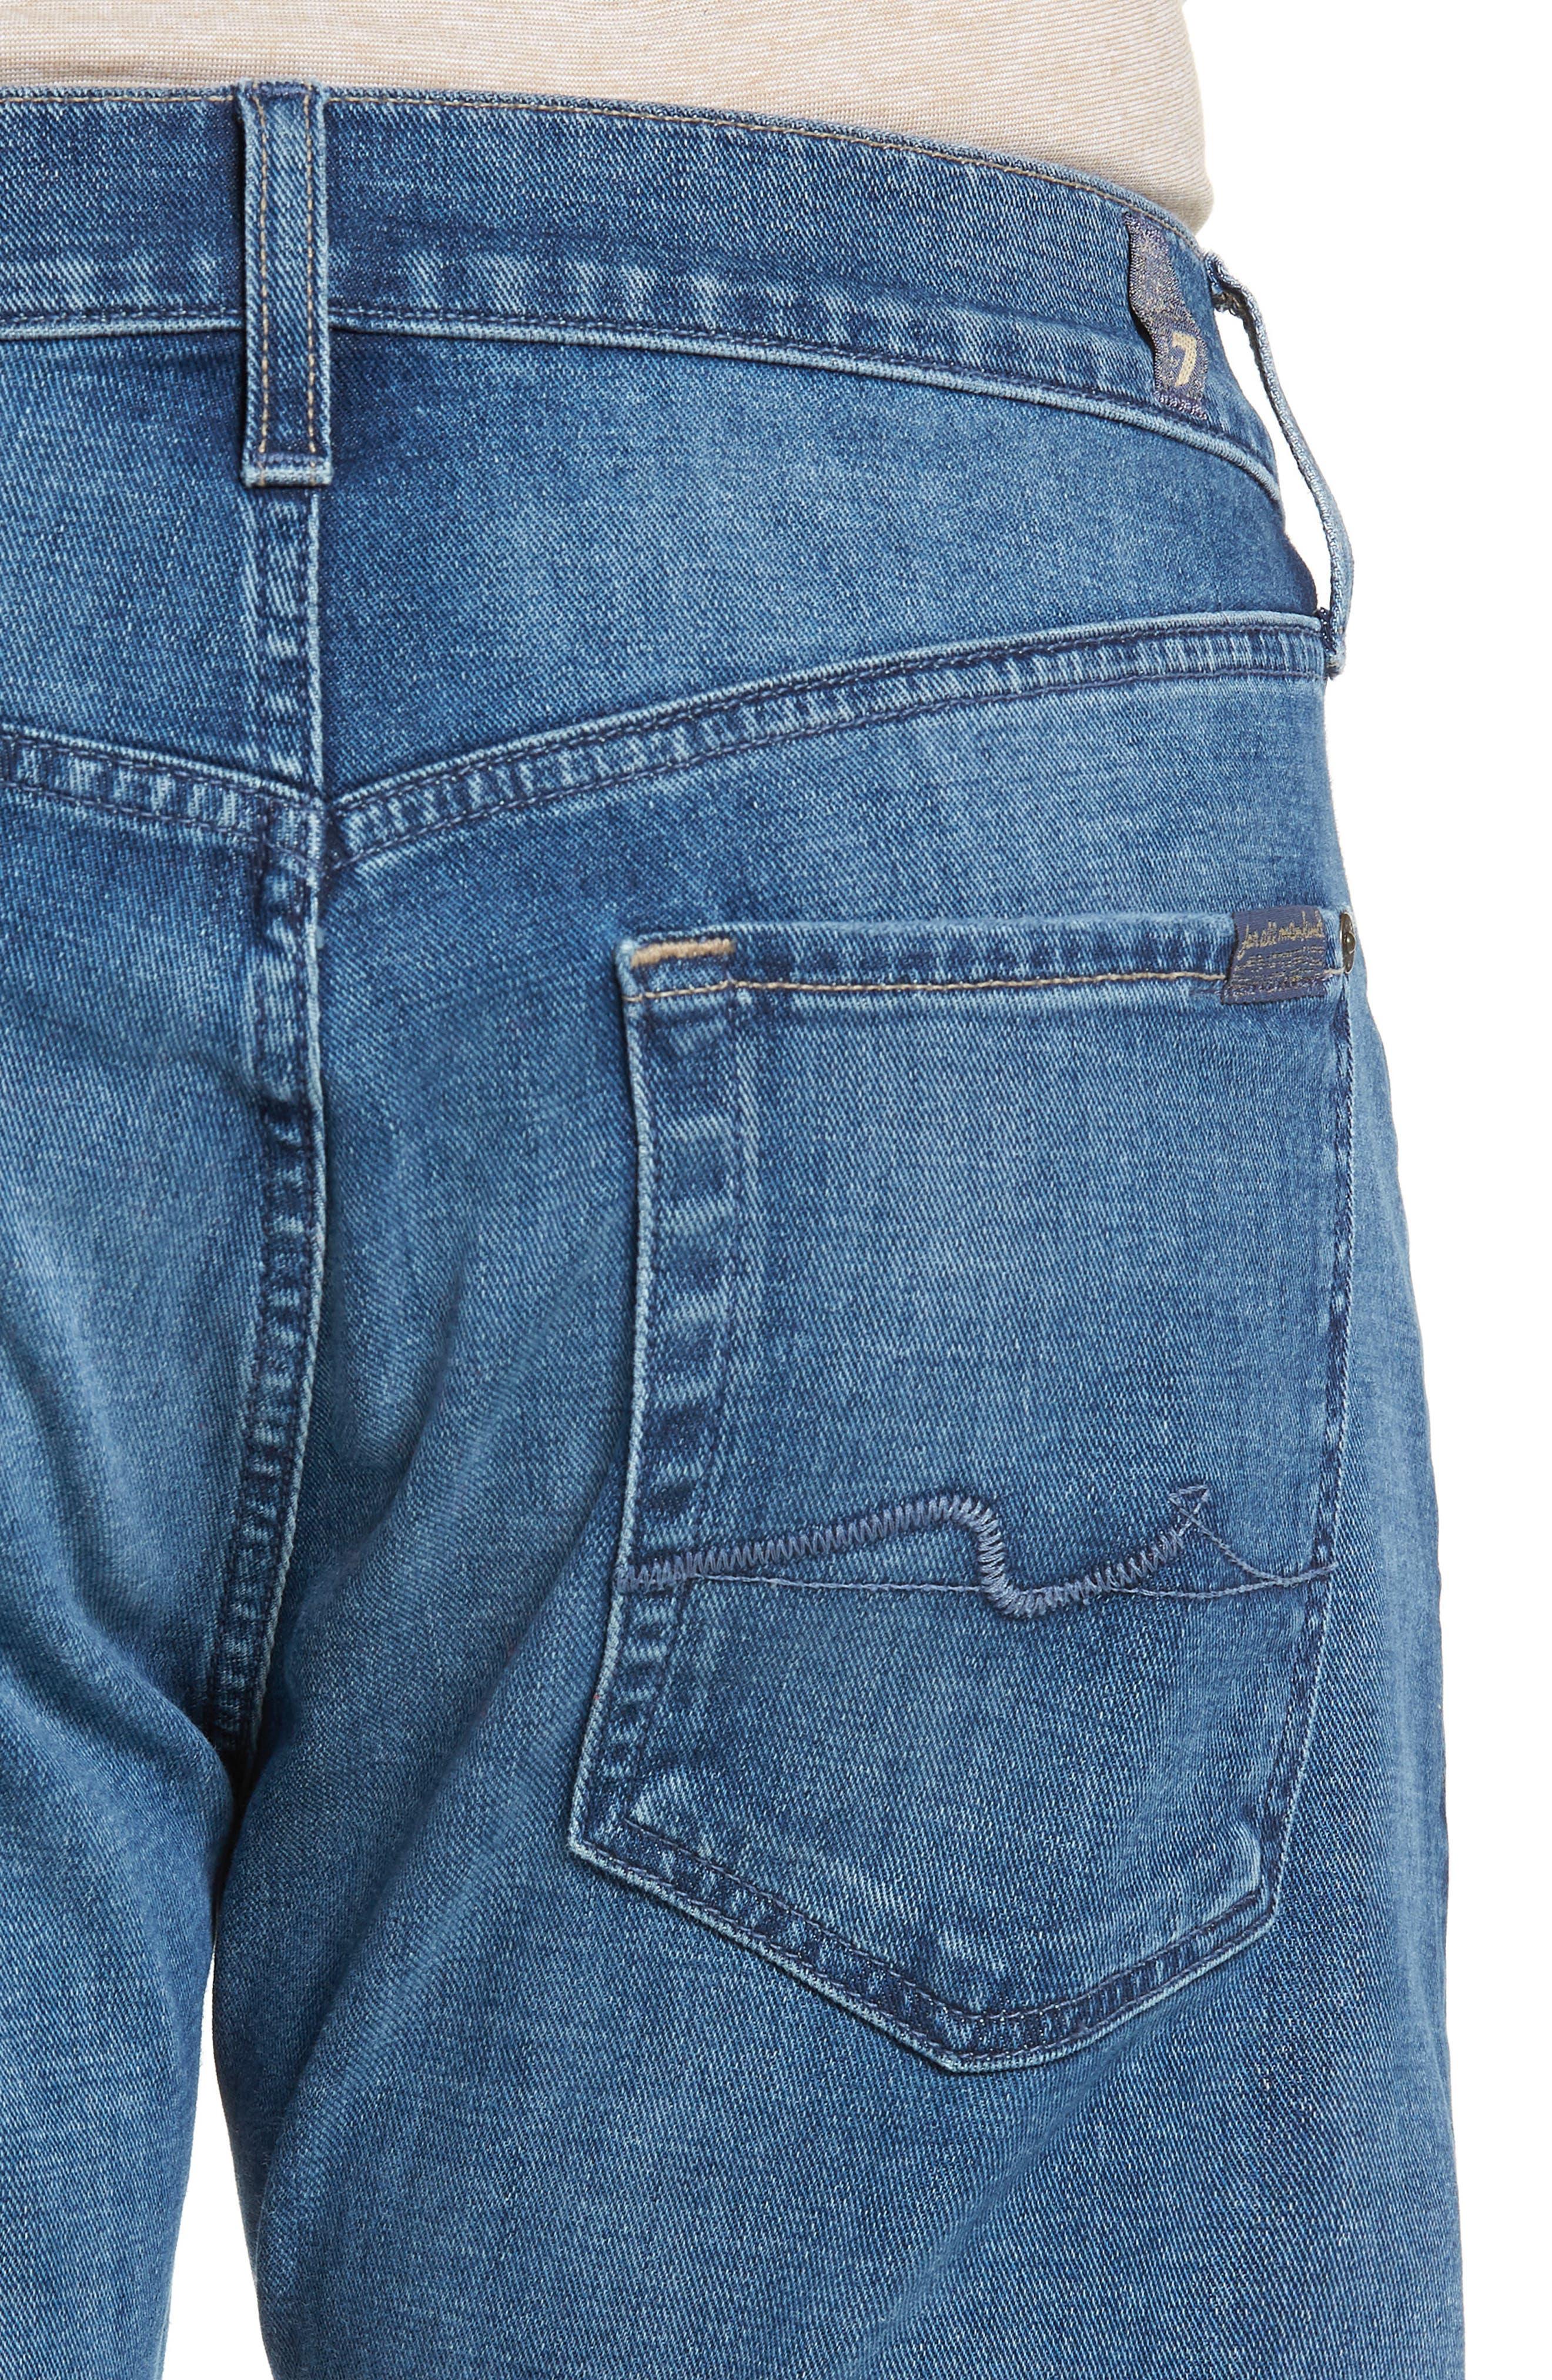 Straight Slim Straight Leg Jeans,                             Alternate thumbnail 4, color,                             LYNNWOOD-LYNN